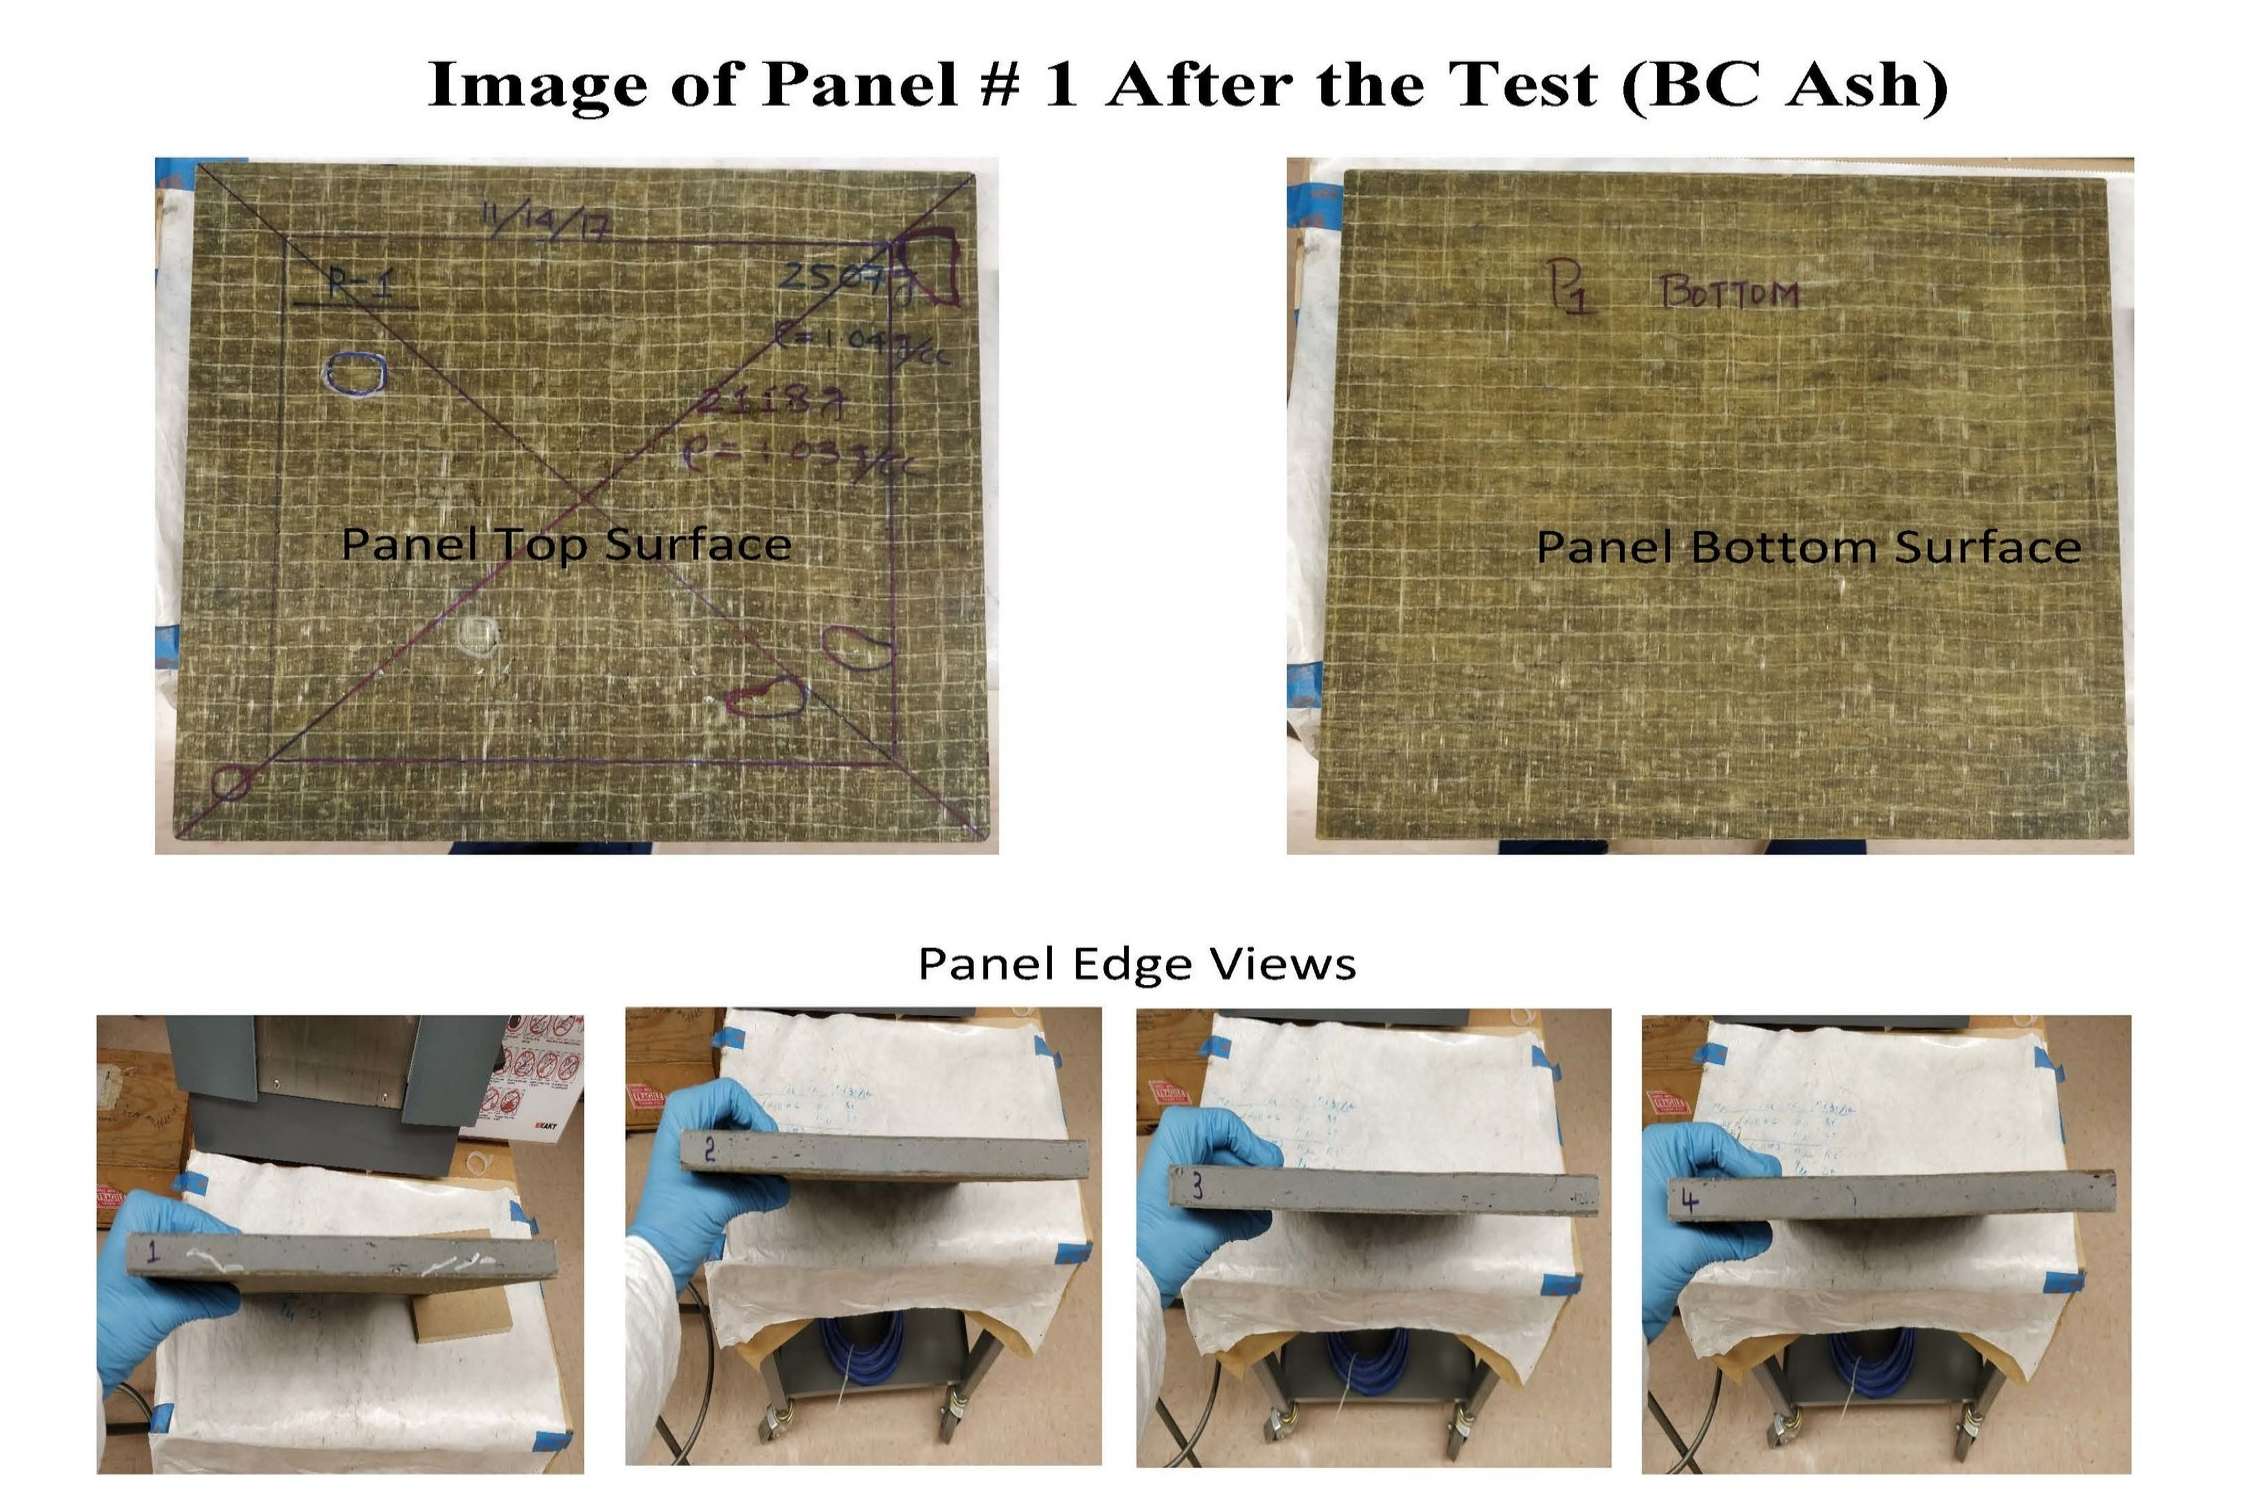 paneltest.jpg